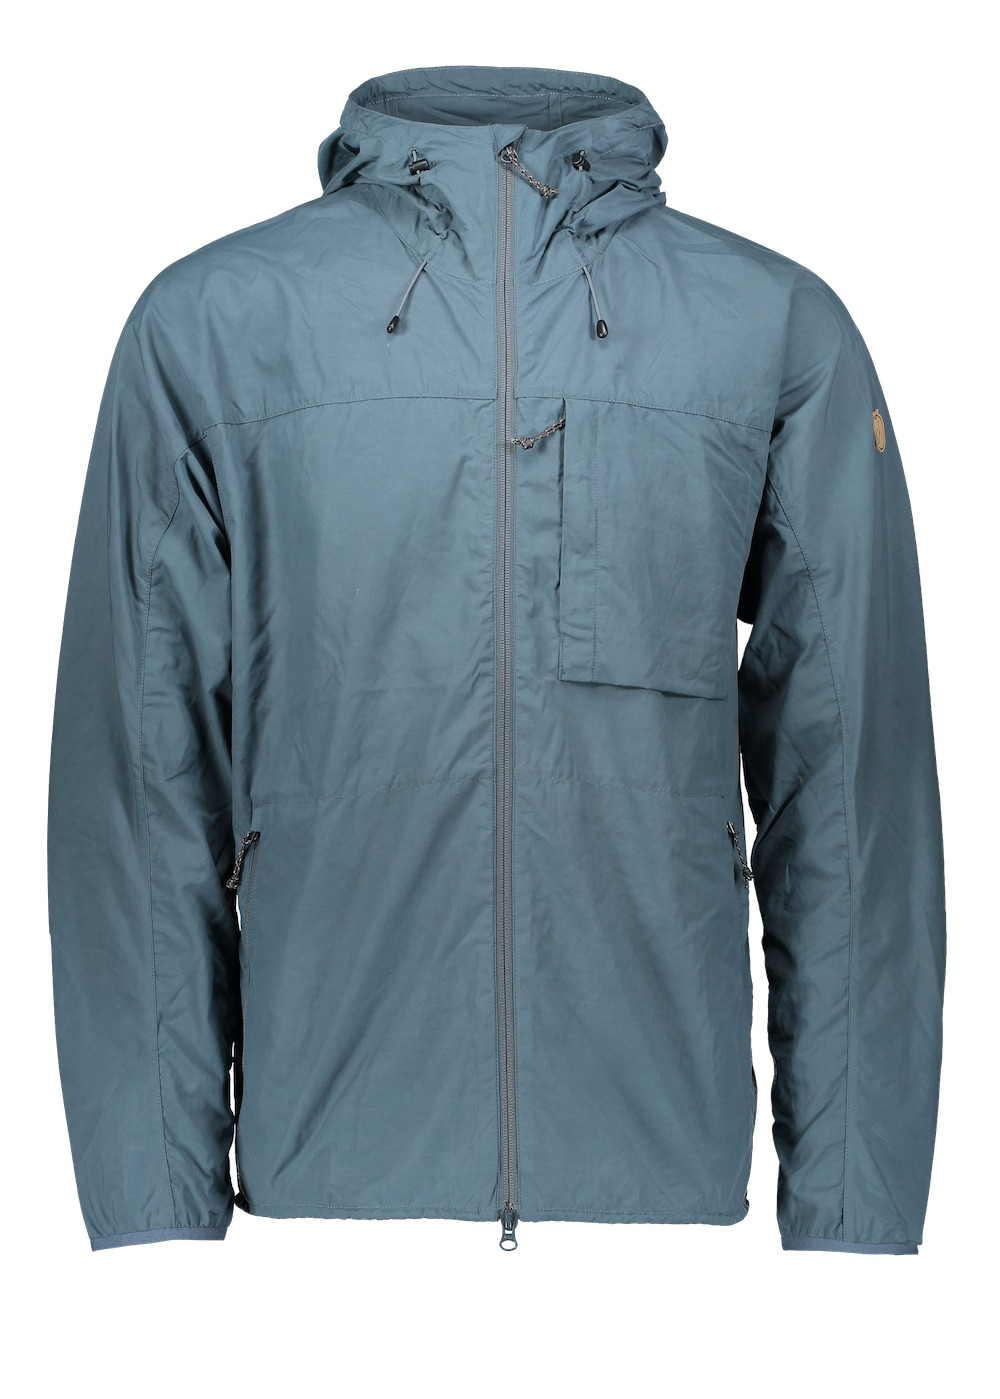 fjallraven men's windproof jackets